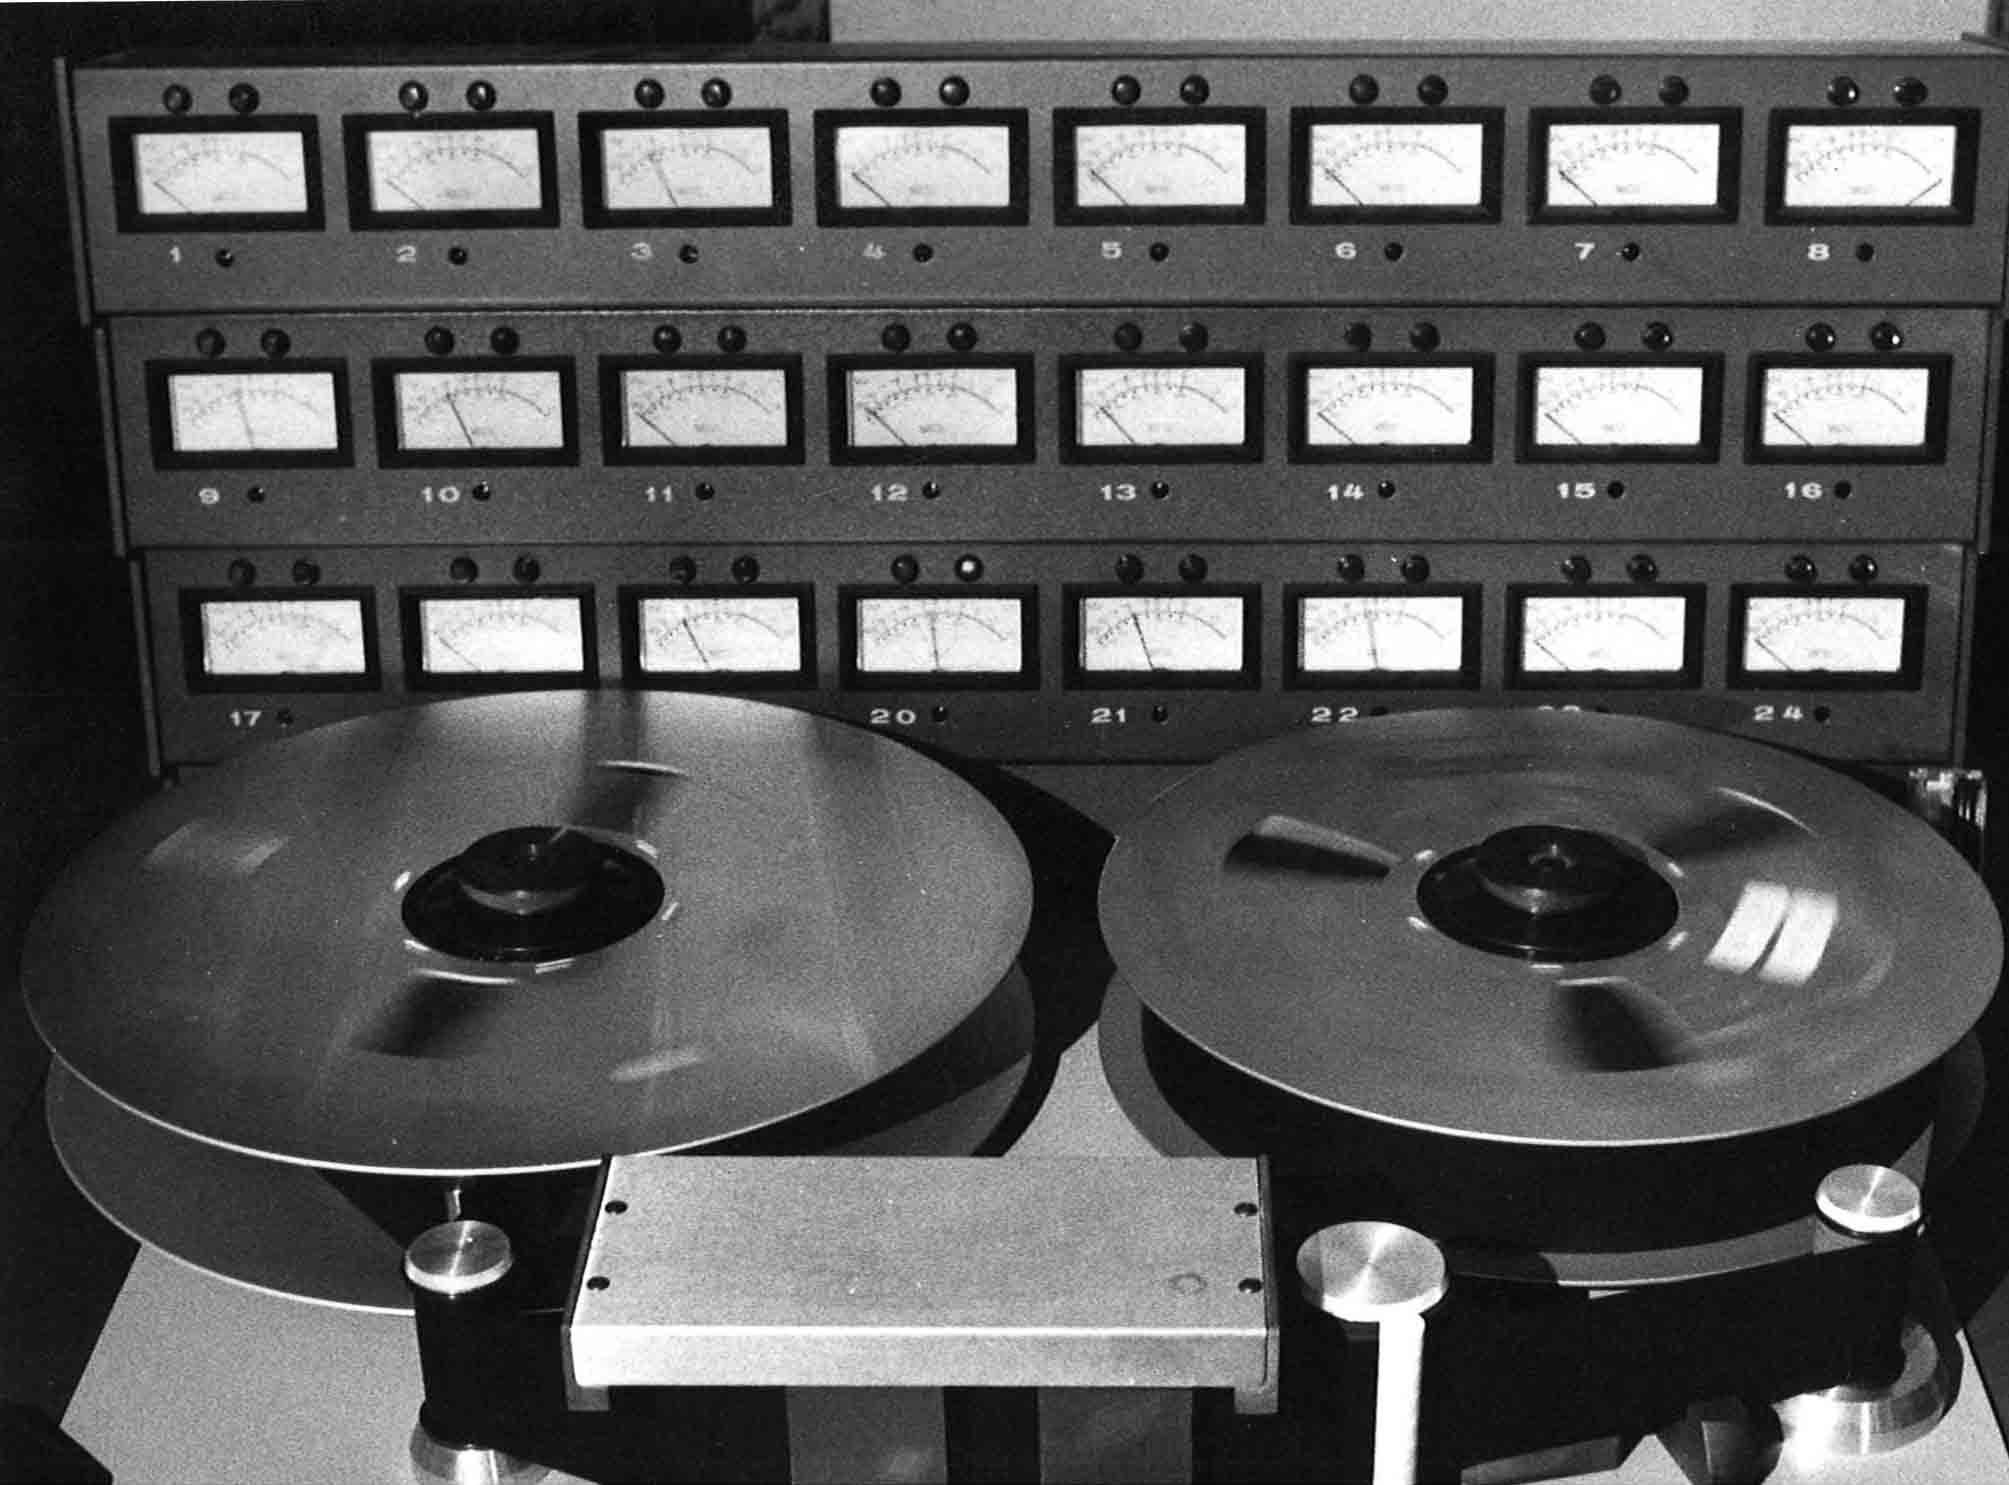 "24 tack recorder 2"" tape."